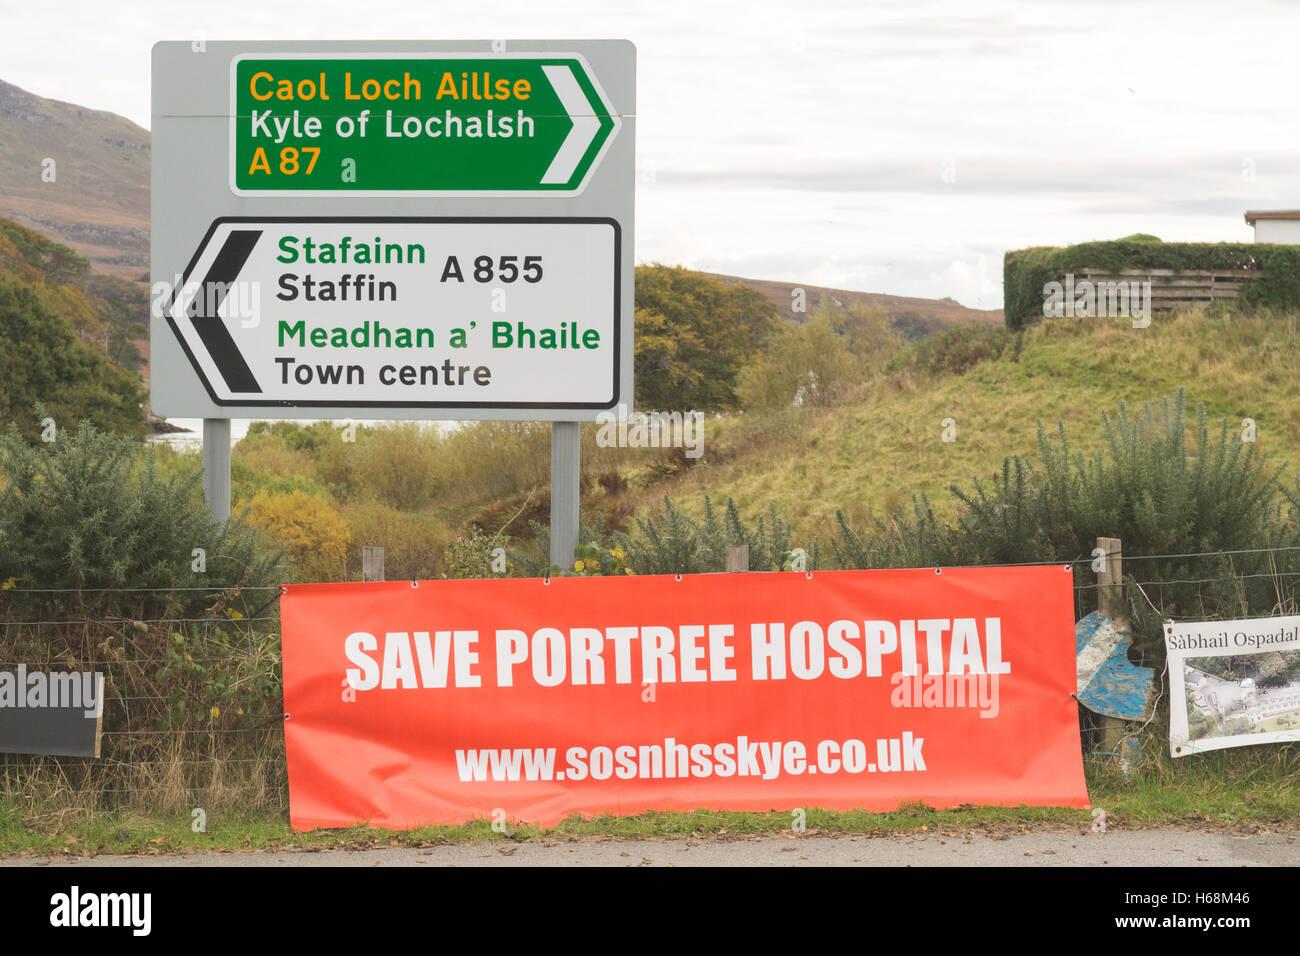 Save Portree Hospital banner, Isle of Skye, Scotland, UK - Stock Image